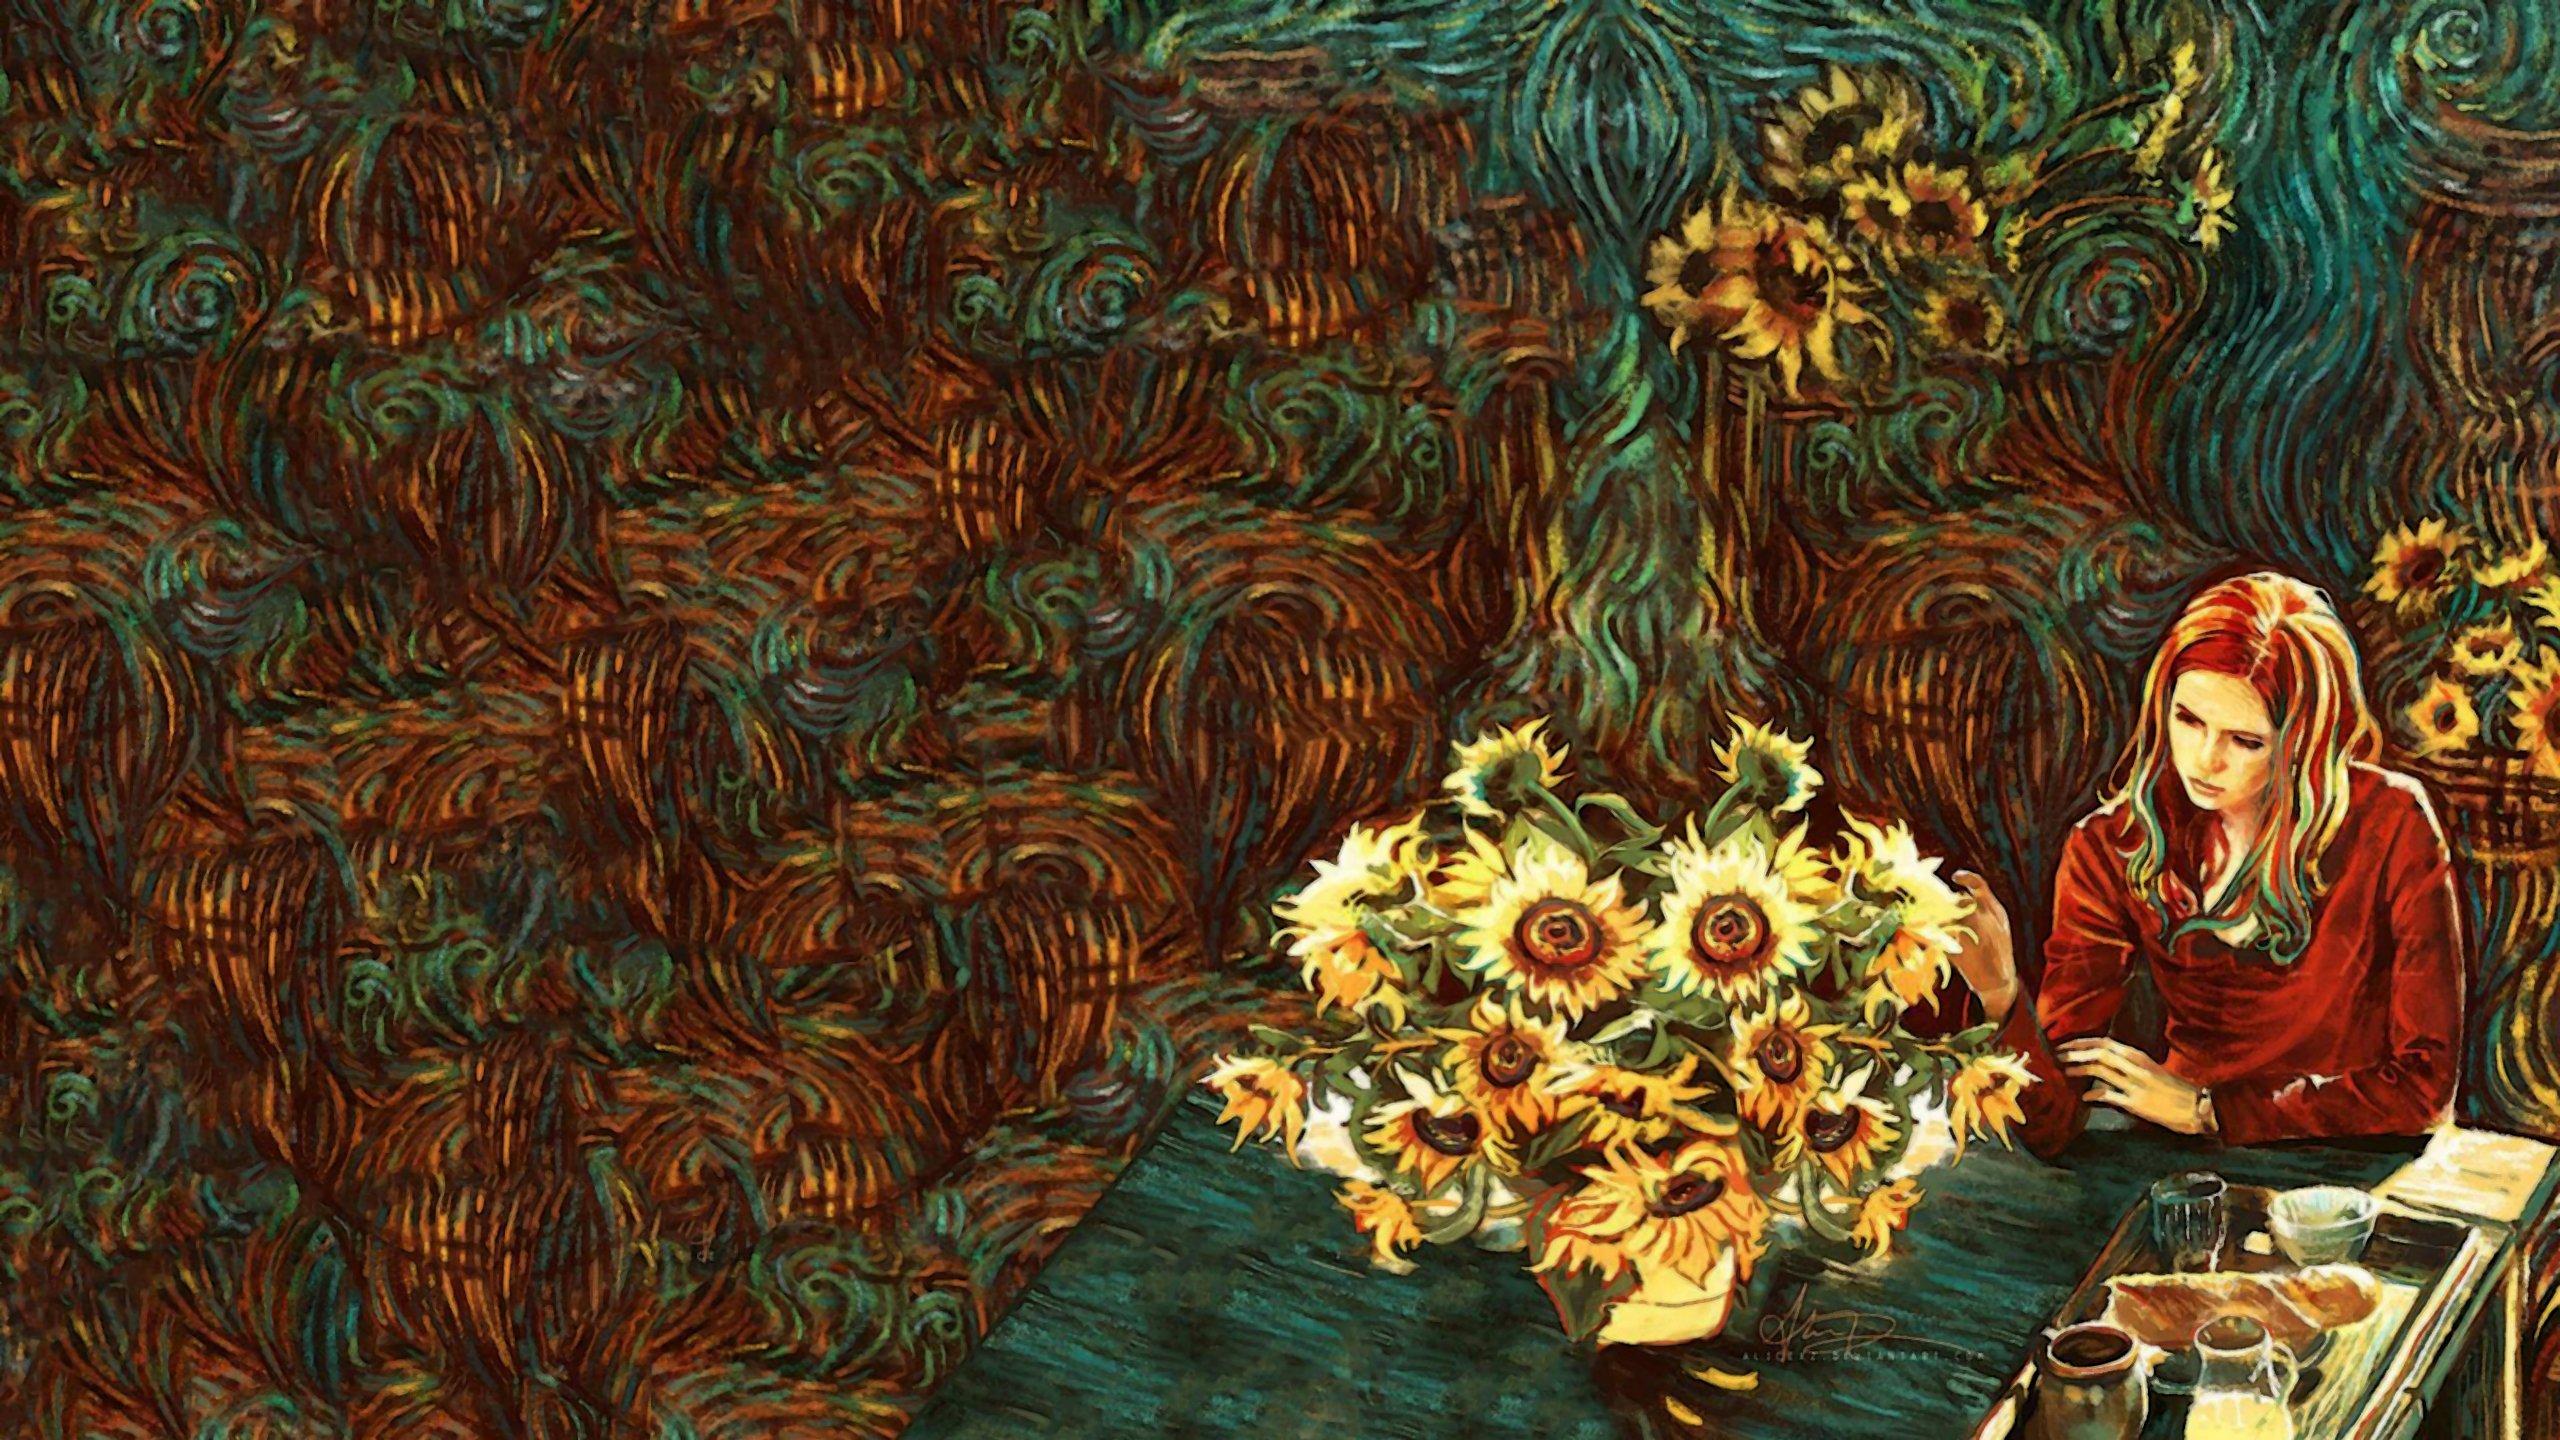 Amy Pond Van Gogh wallpaper 2560x1440 395493 WallpaperUP 2560x1440